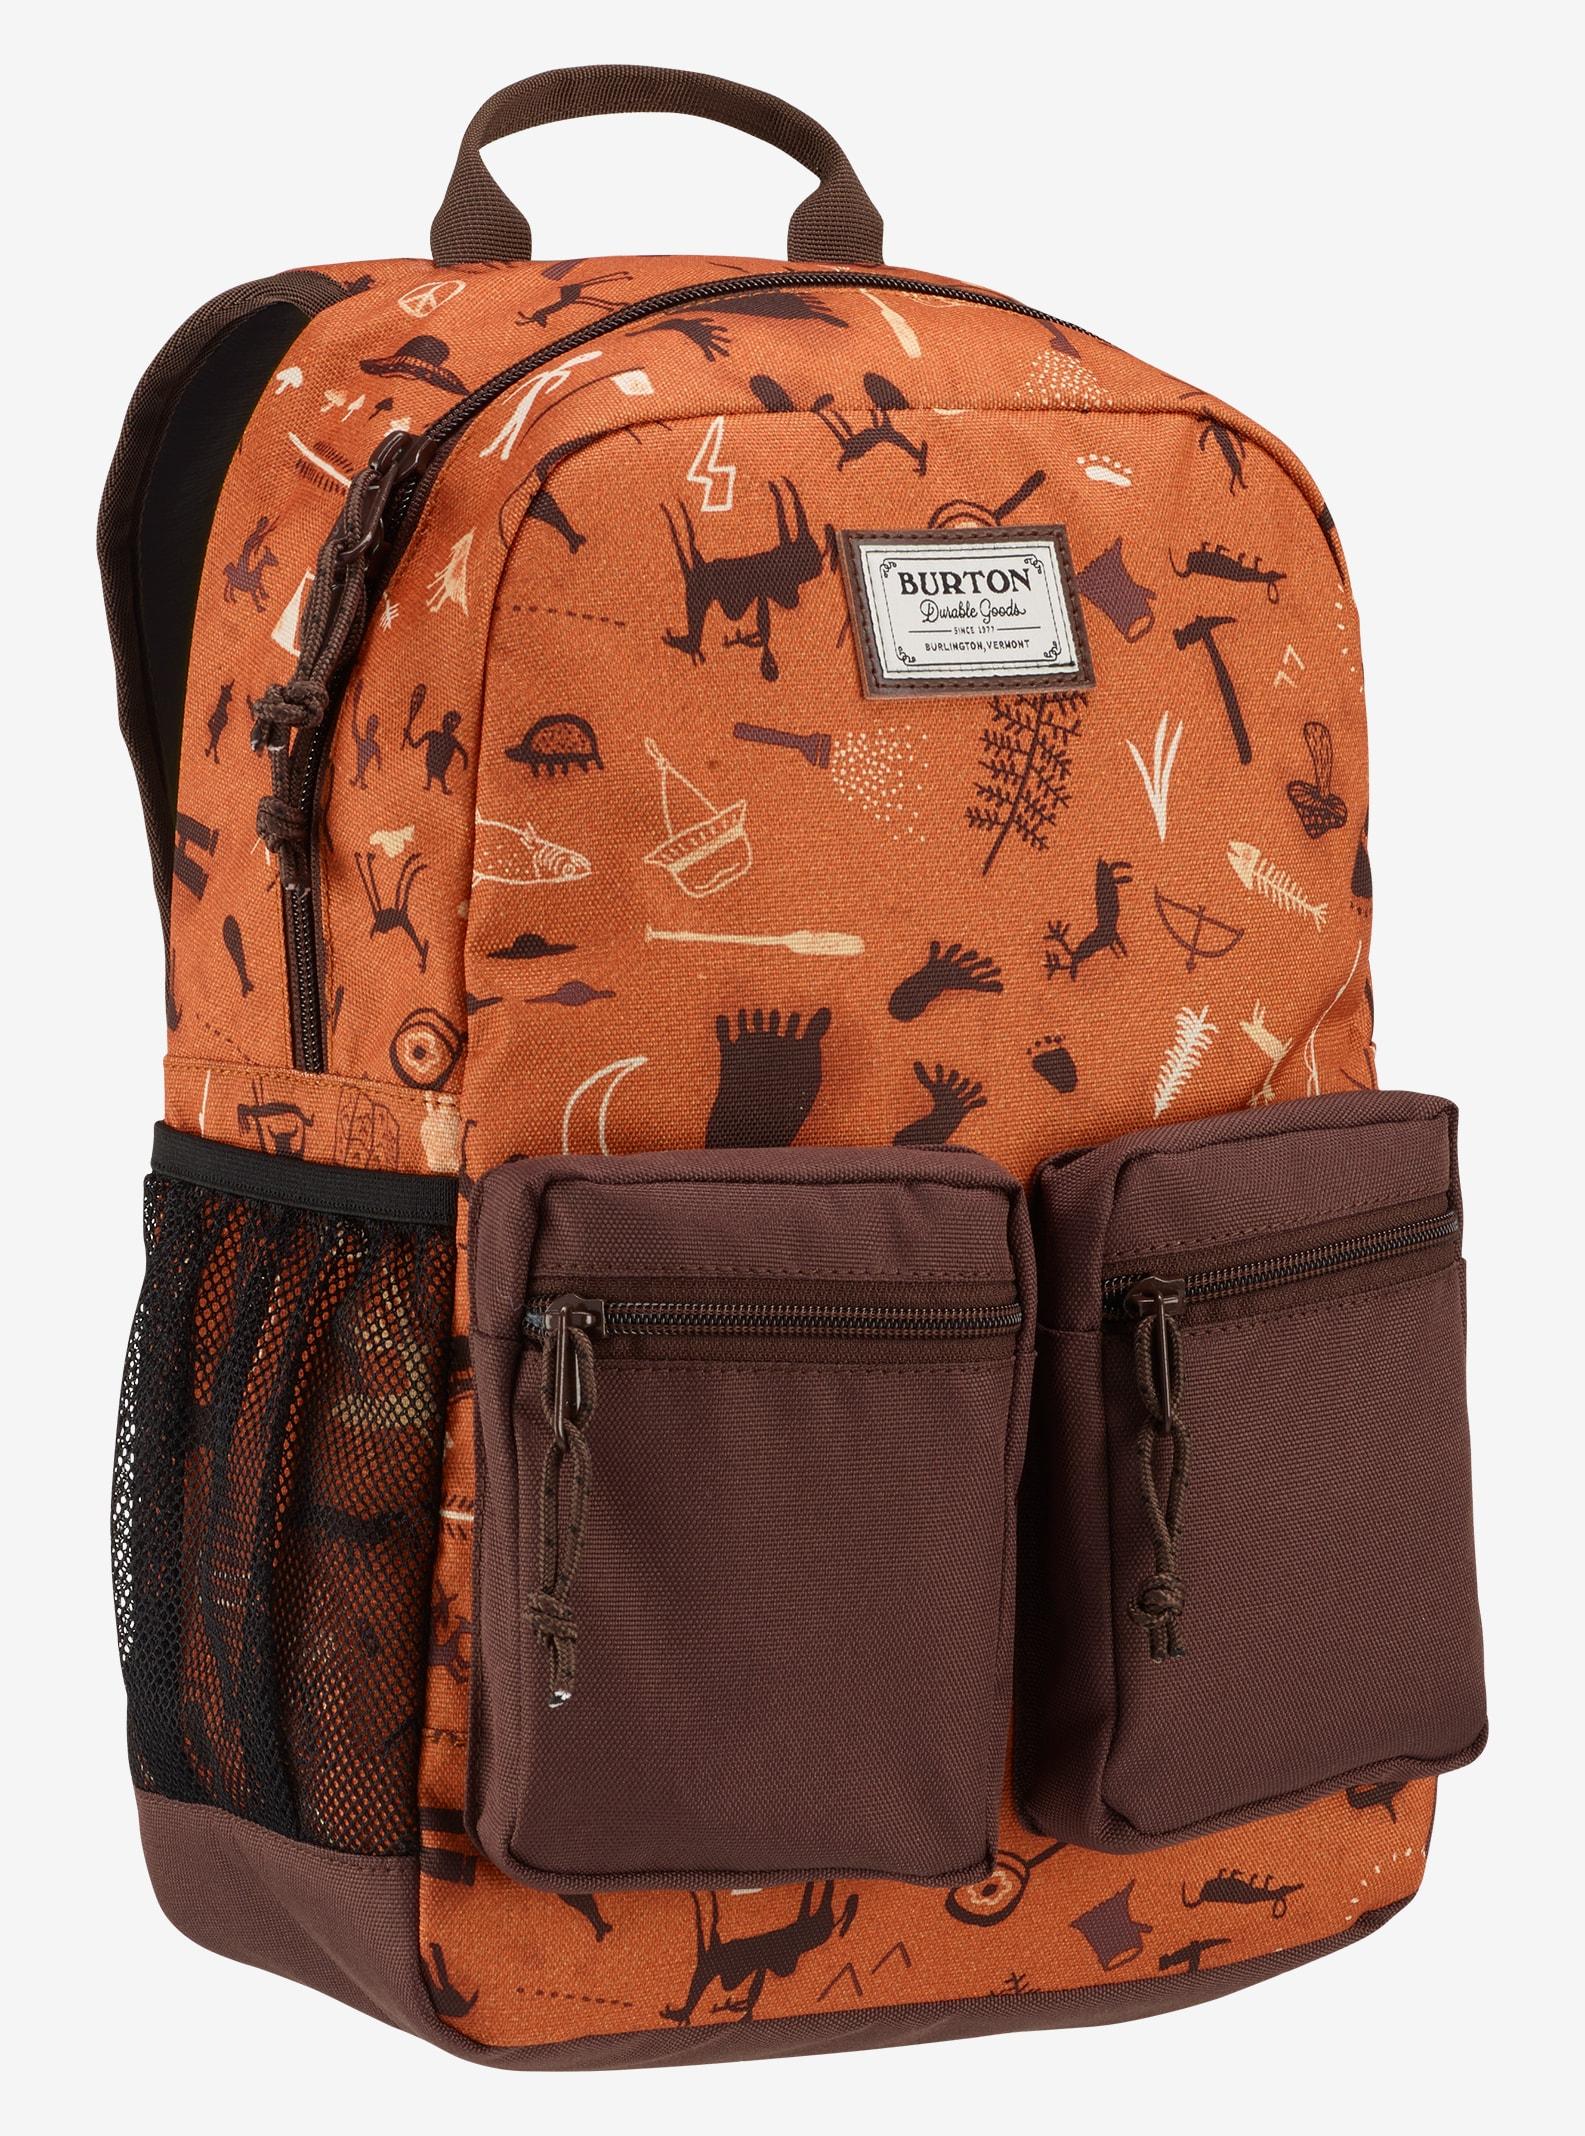 Burton Kids' Gromlet Backpack shown in Caveman Print